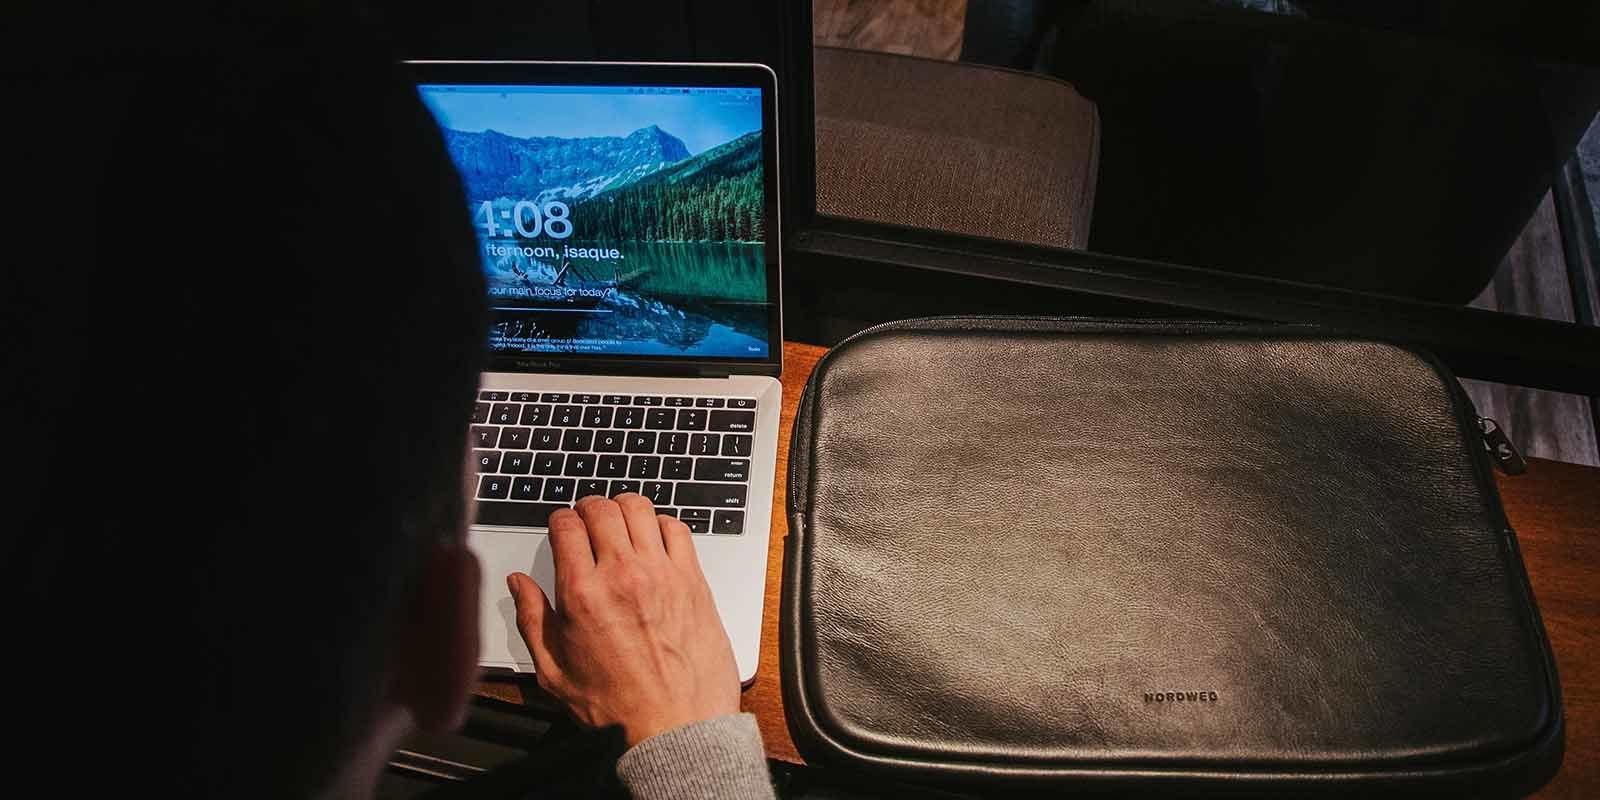 Case de notebook em couro nordweg macbook